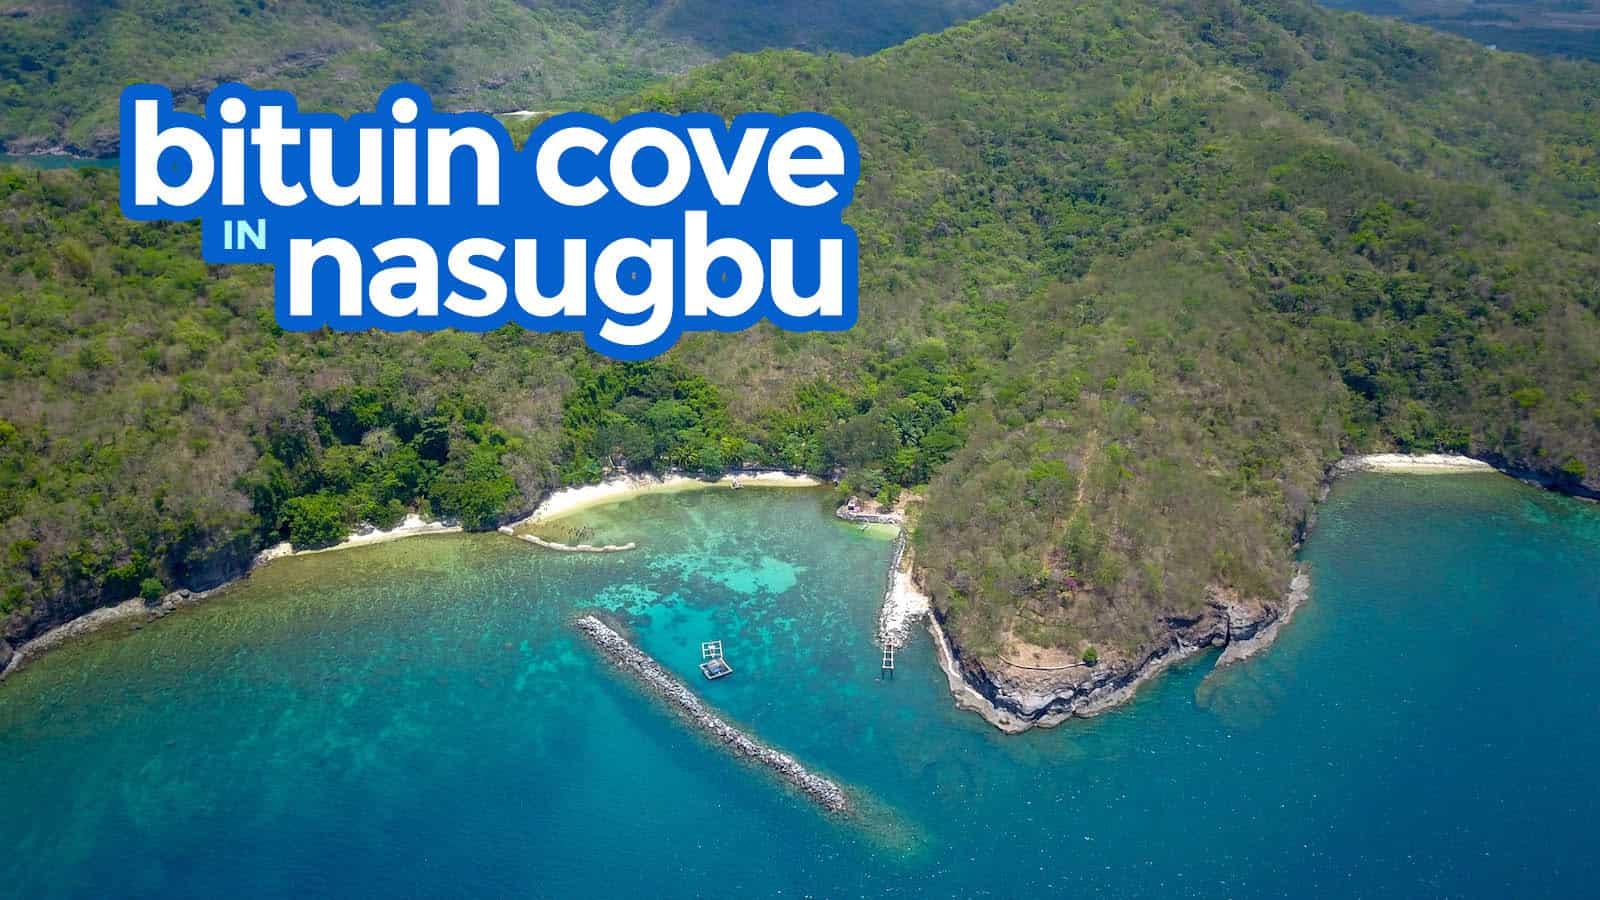 BITUIN COVE, NASUGBU: Travel Guide & Budget Itinerary